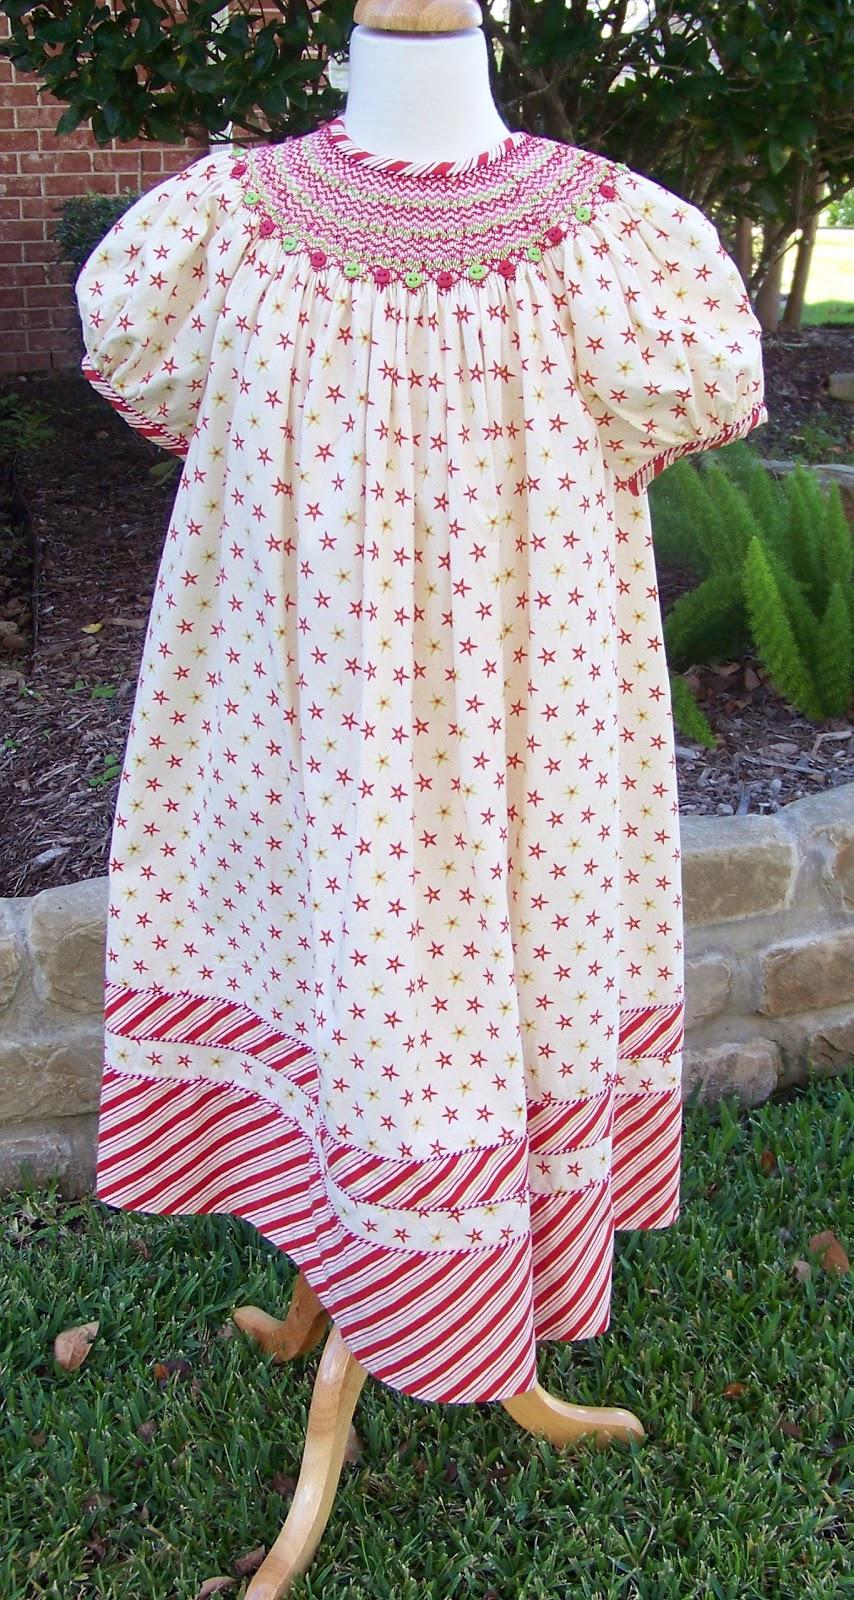 Toddler Bishop Dress Pattern Related Keywords & Suggestions